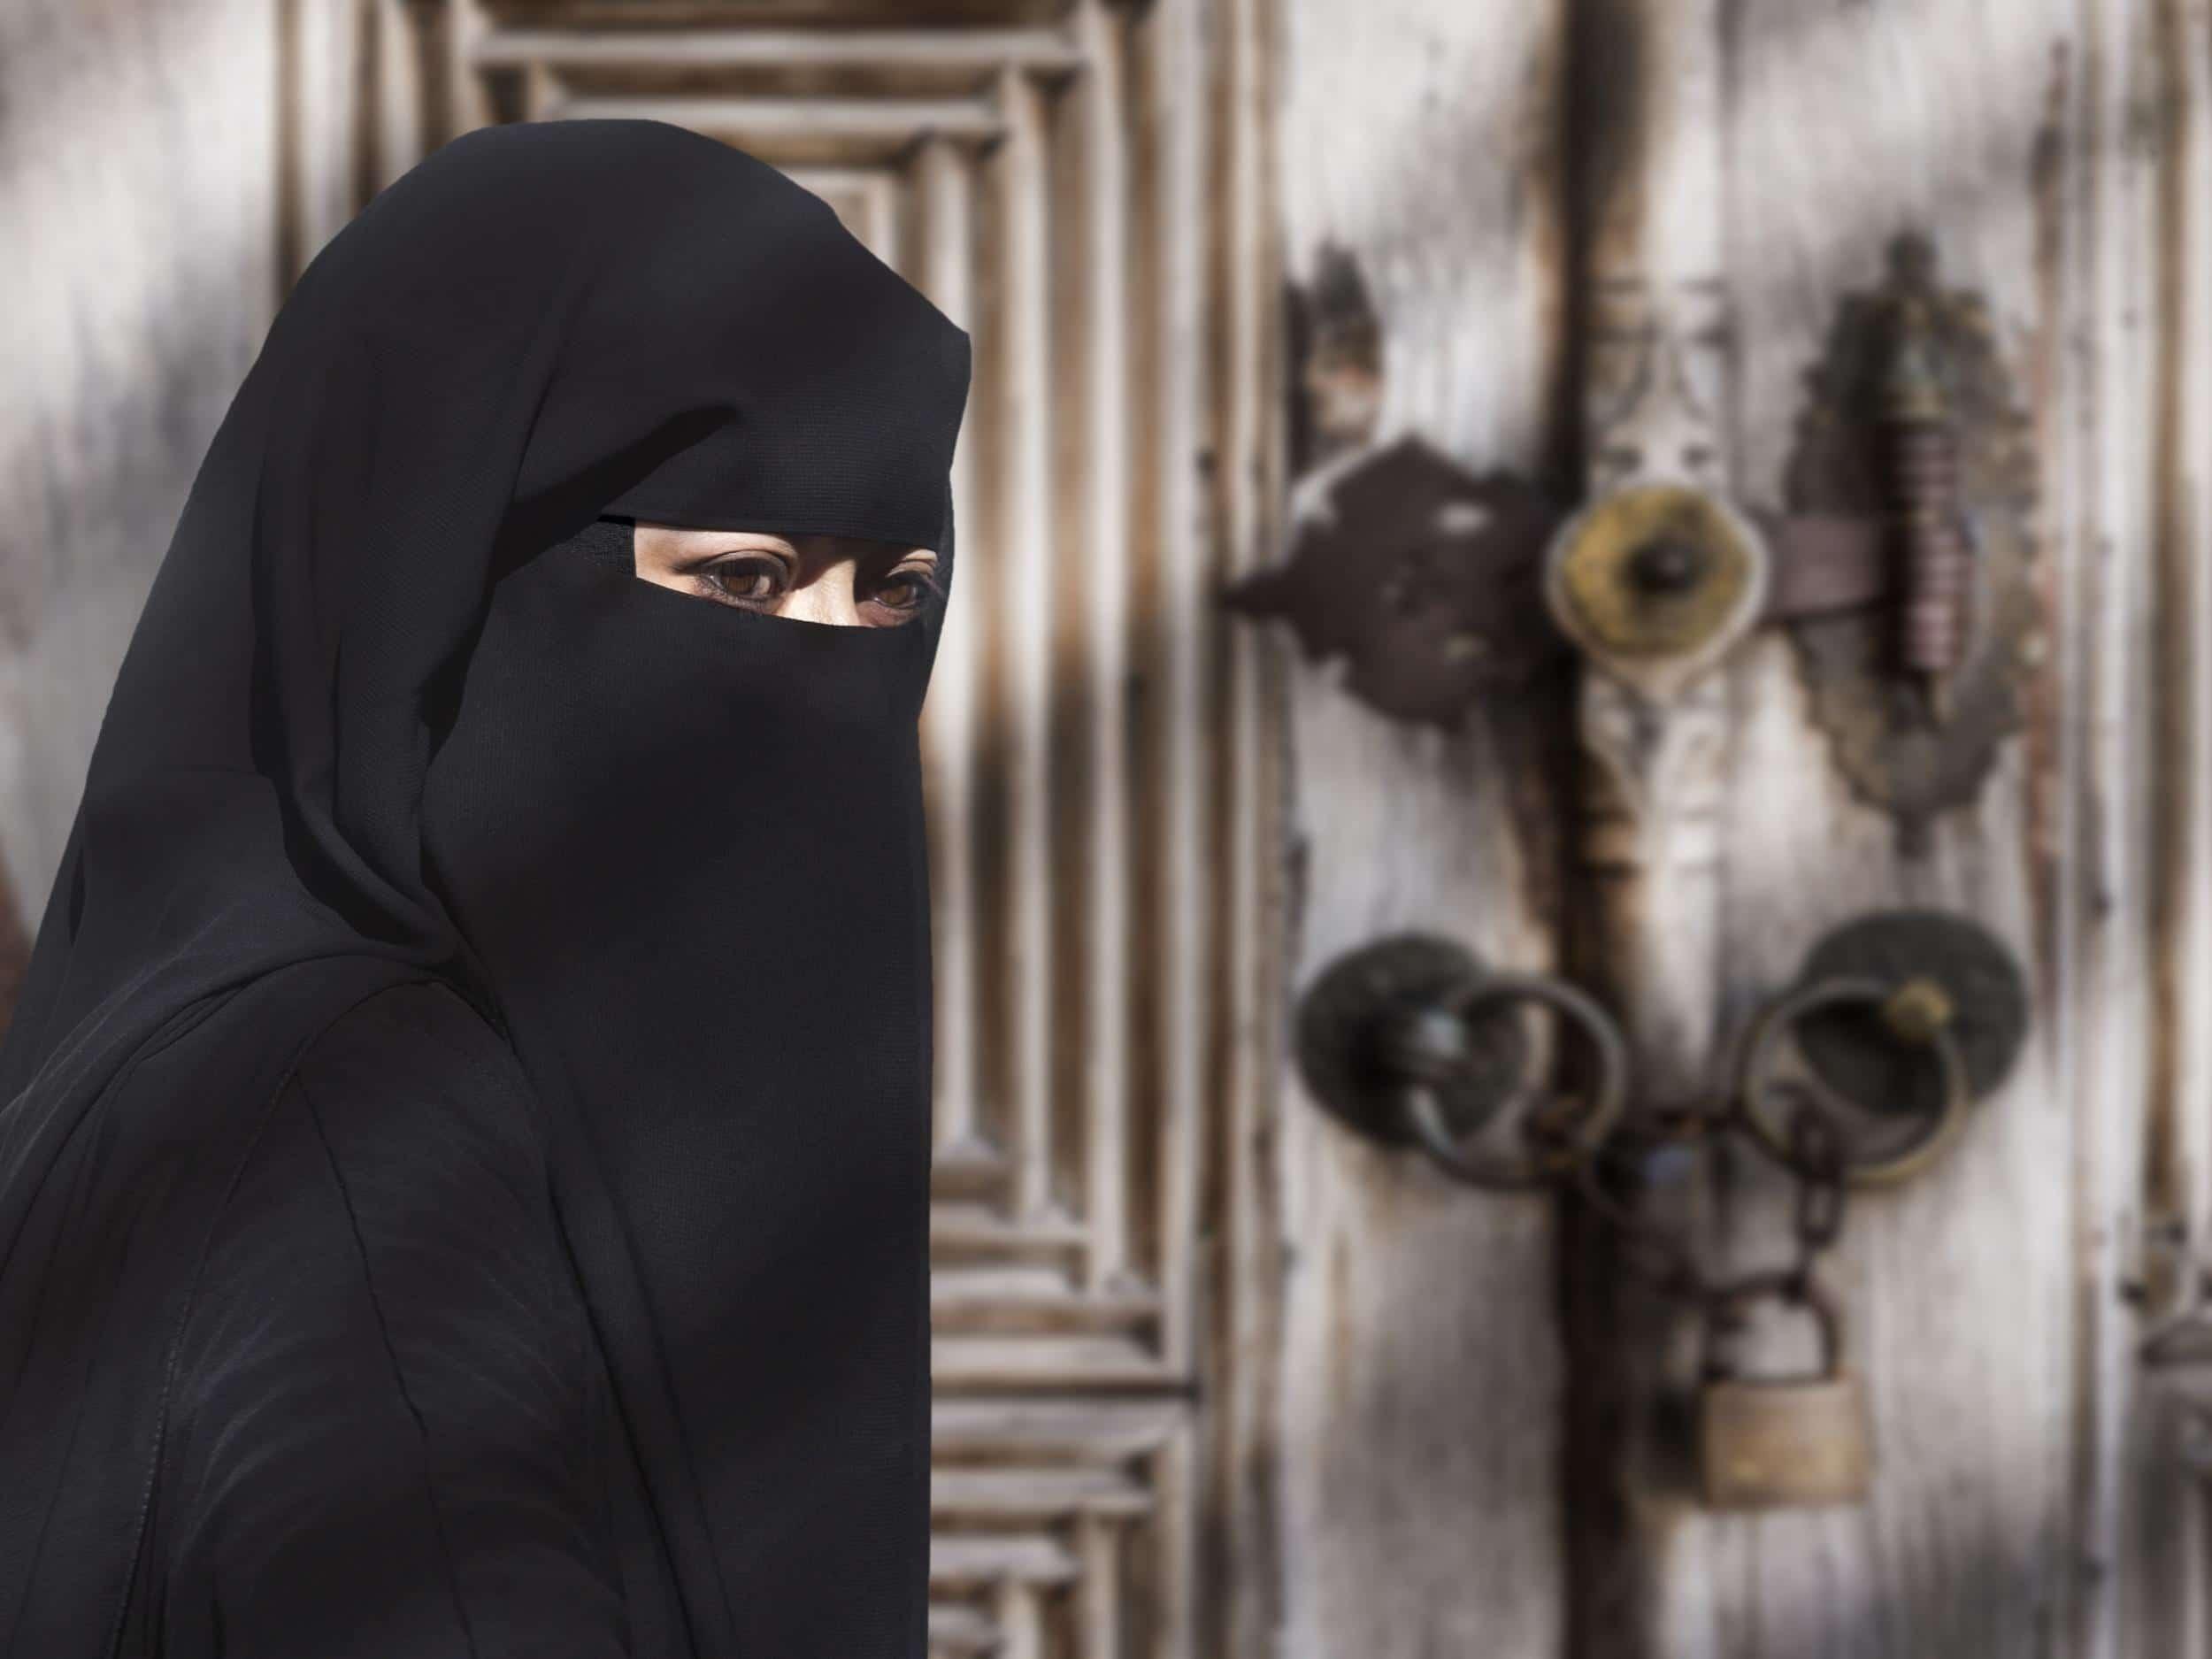 lega velo islamico luoghi pubblici